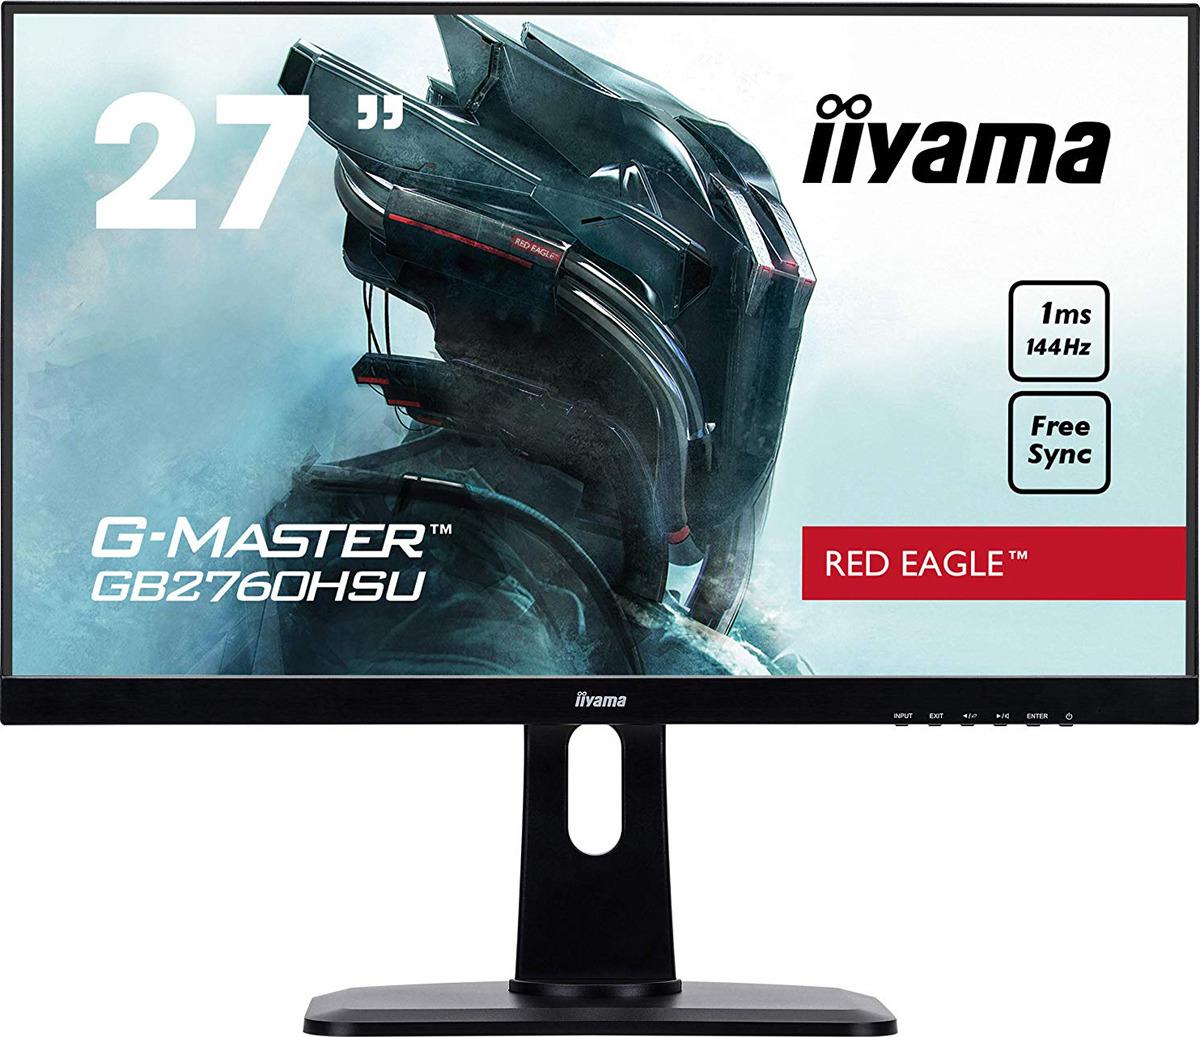 Монитор Iiyama 27 G-Master GB2760HSU-B1, черный монитор iiyama g master gb2760hsu b1 черный